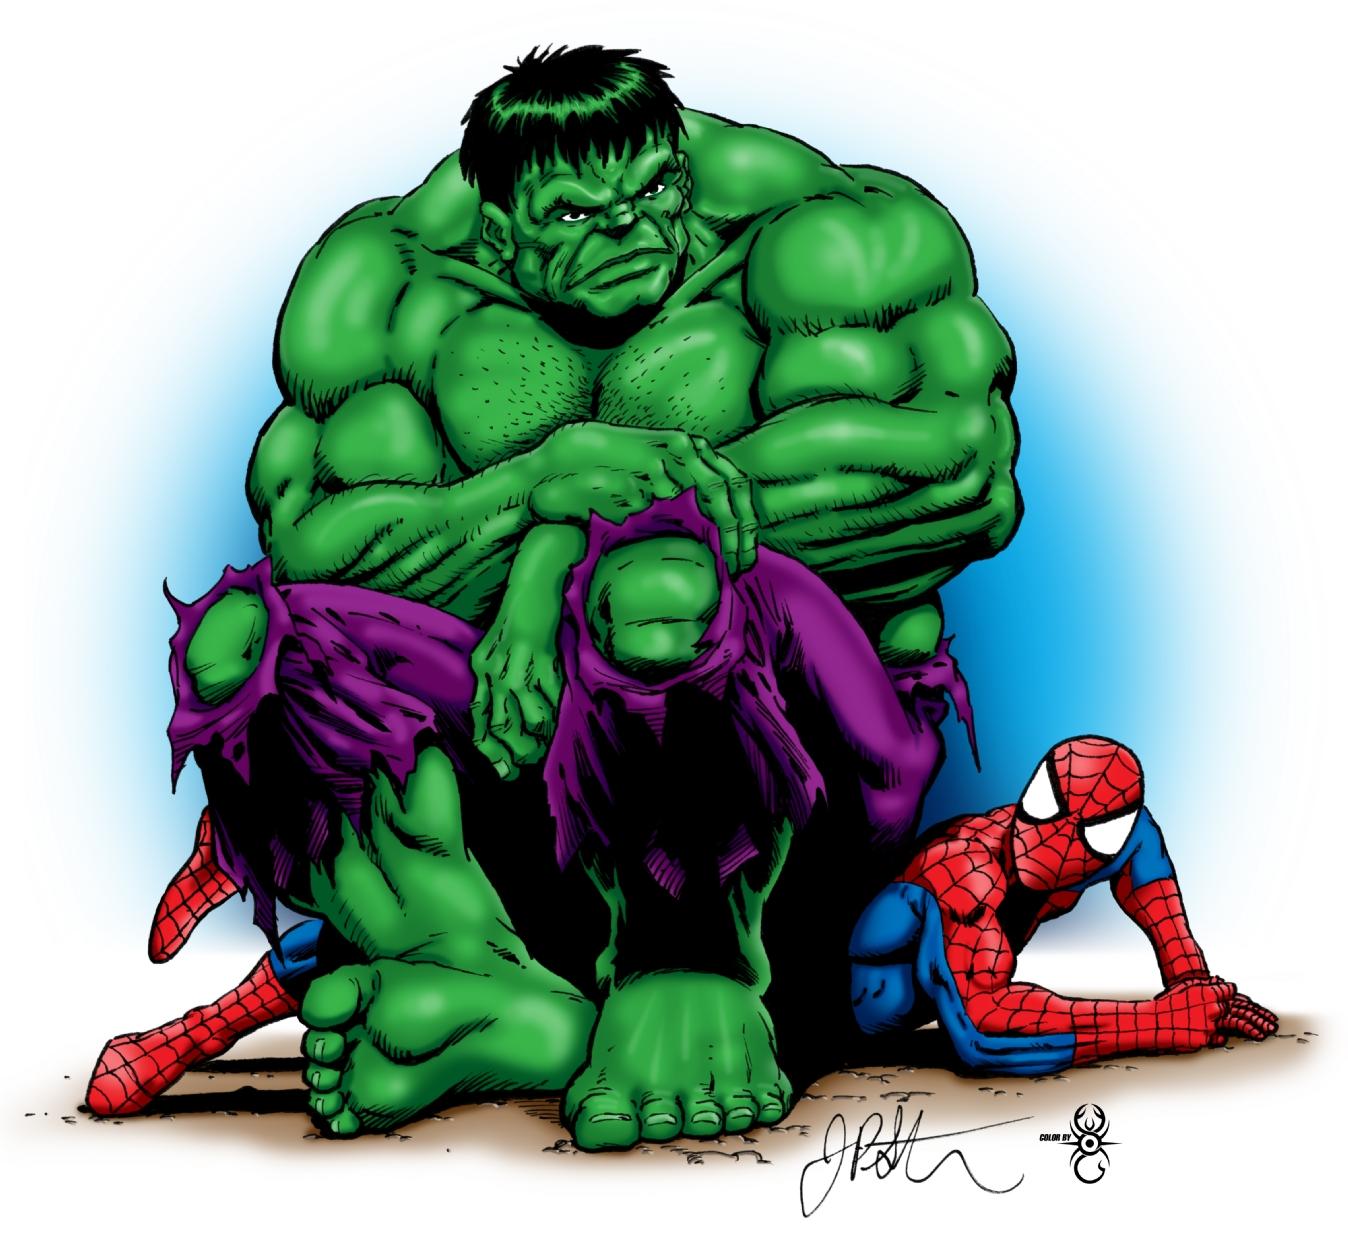 Hulk & Spiderman -colored, in John Braun's Hulk Versus